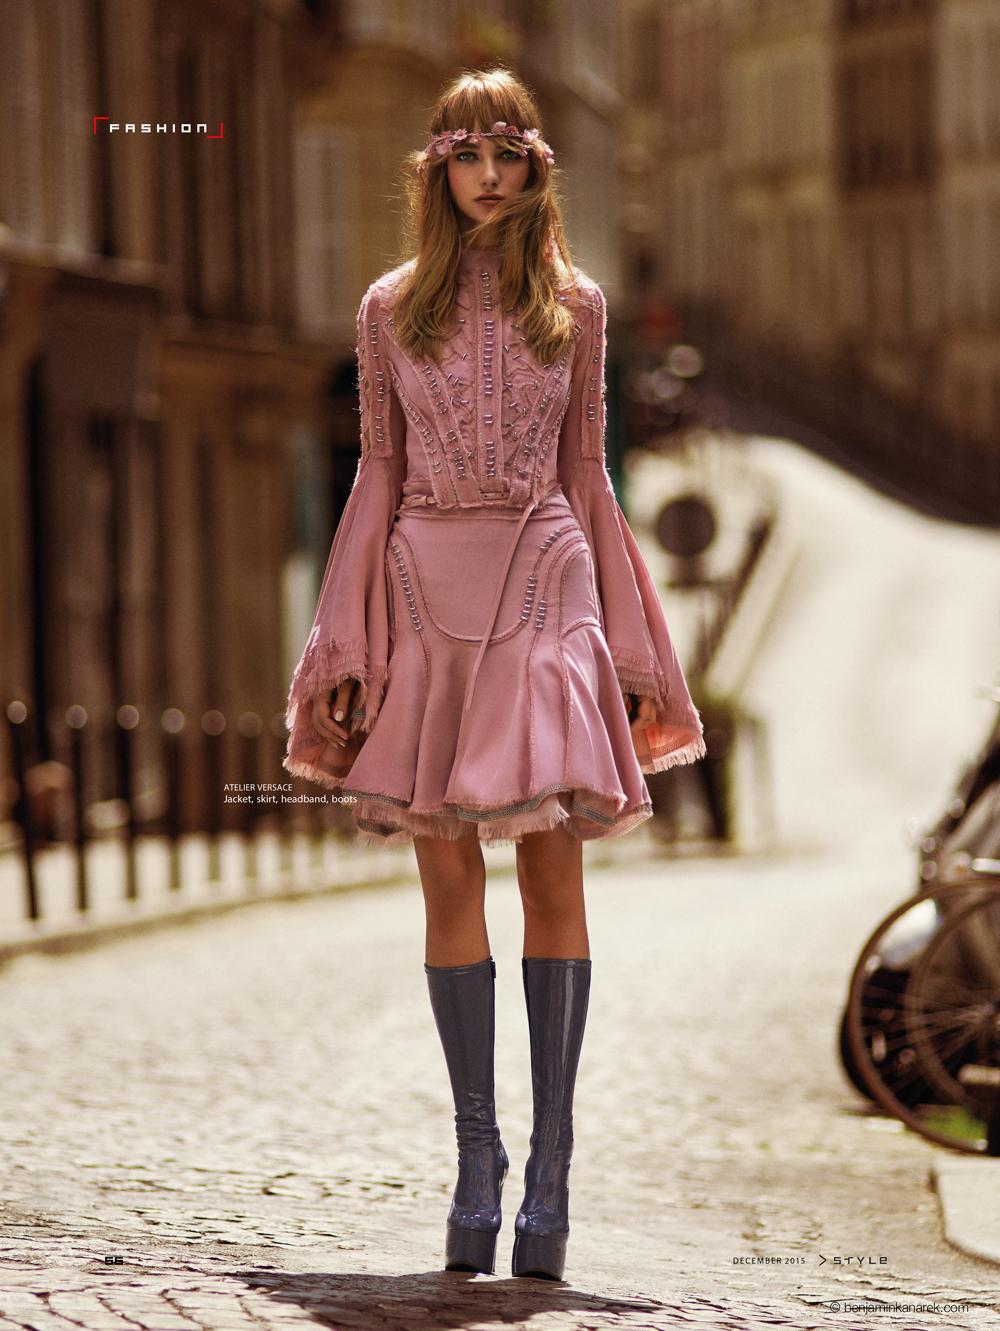 Alexandra Tikerpuu in Atelier Versace © Benjamin Kanarek